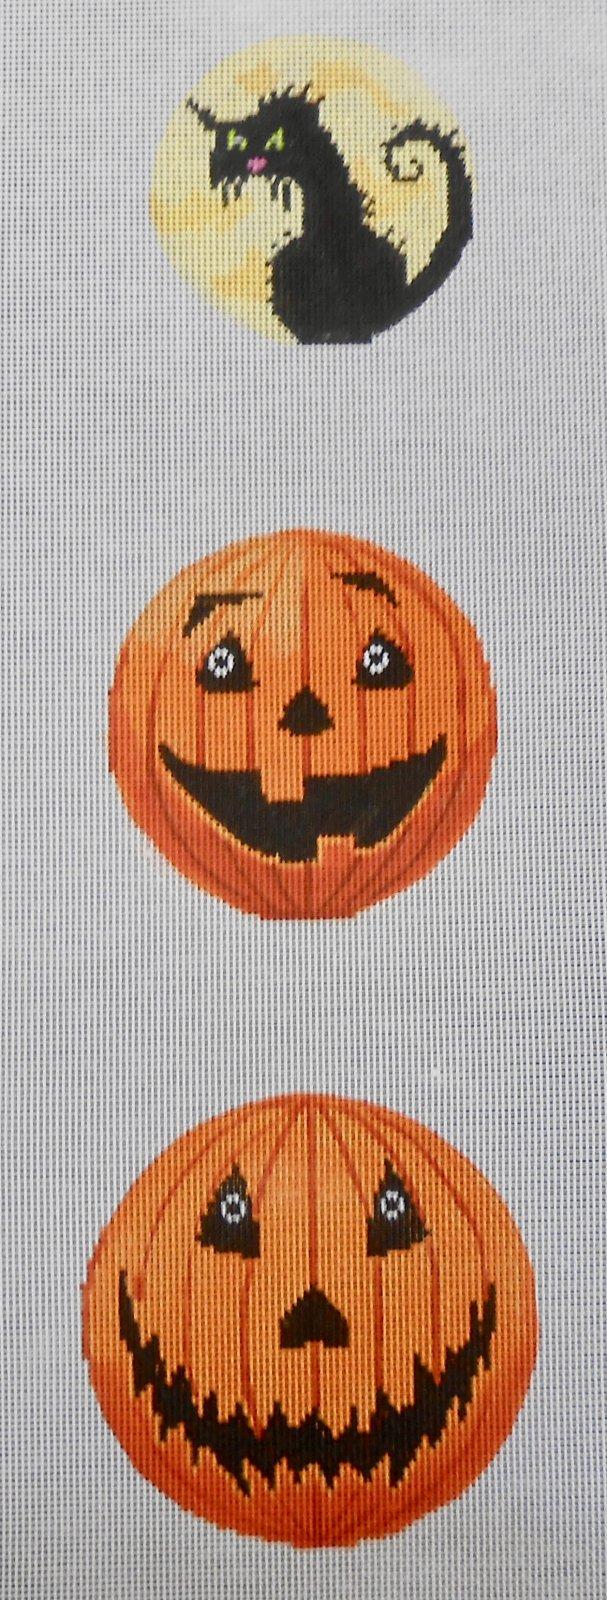 Three Piece Halloween ornament - 2 pumpkins & 1 cat